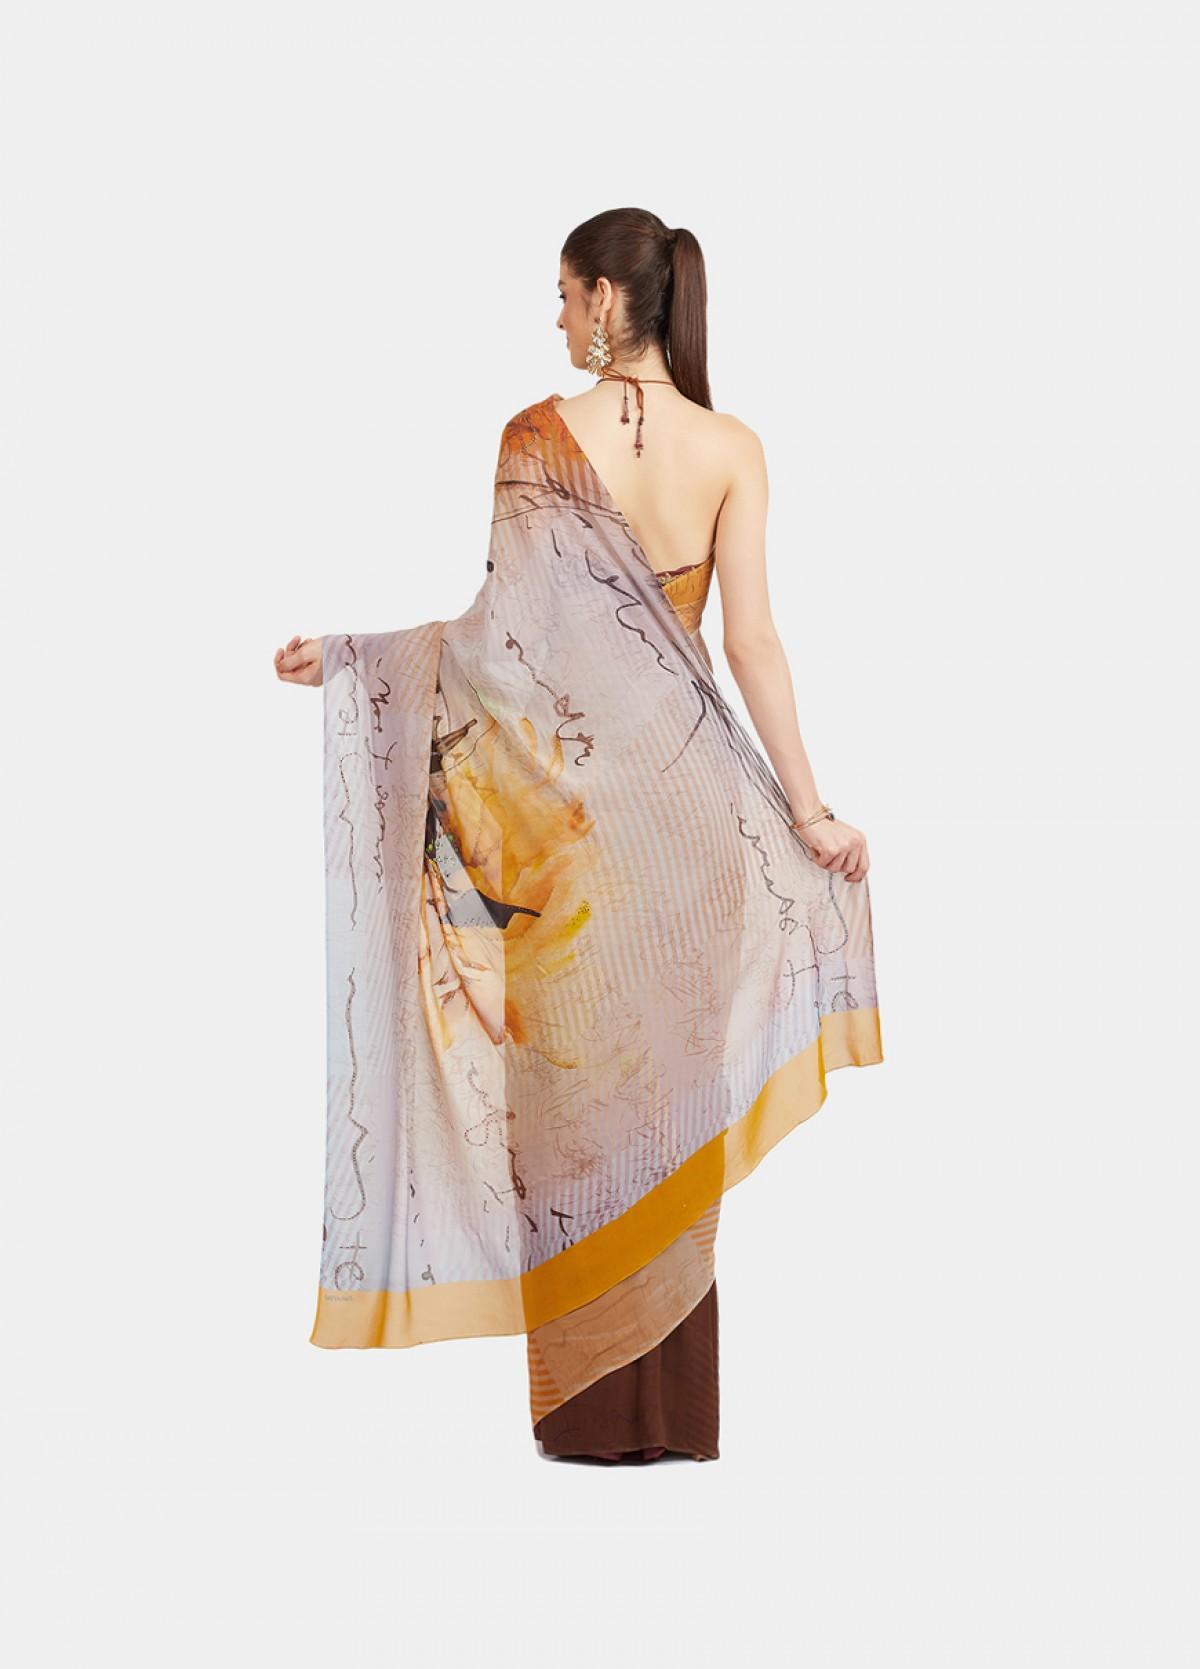 The Chrysanthemum Sari